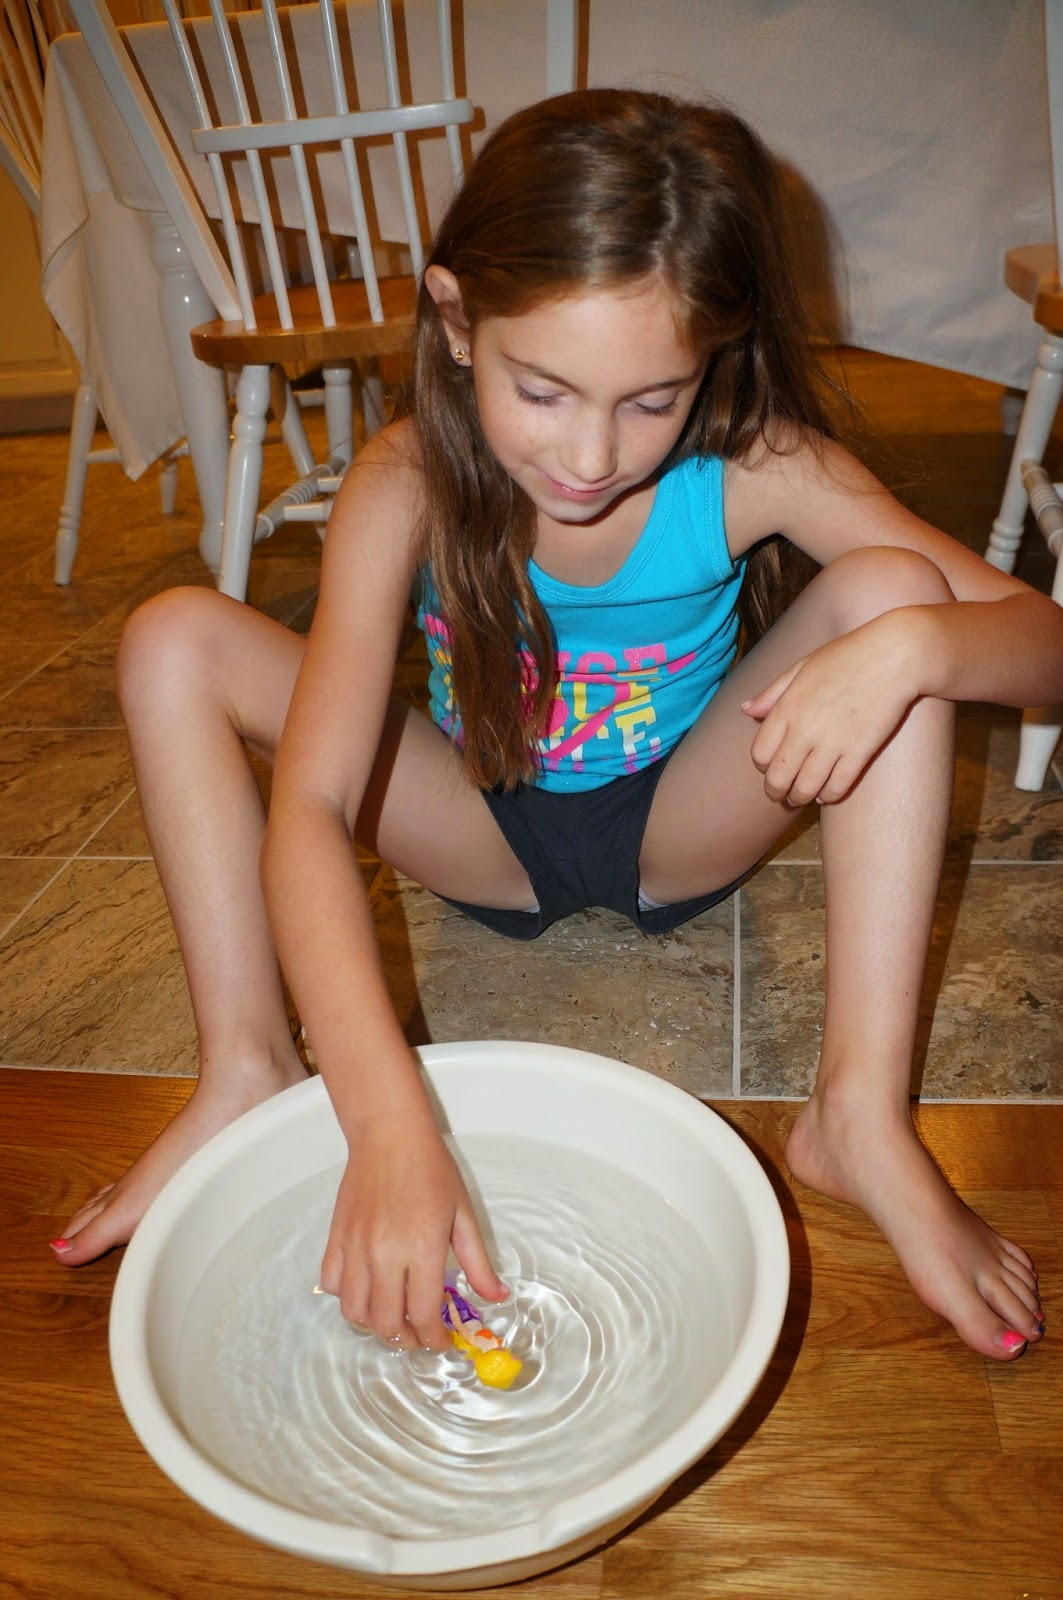 Little mermaid bathroom - Lauren Giggling Away Watching Her Swim She Really Enjoyed Playing